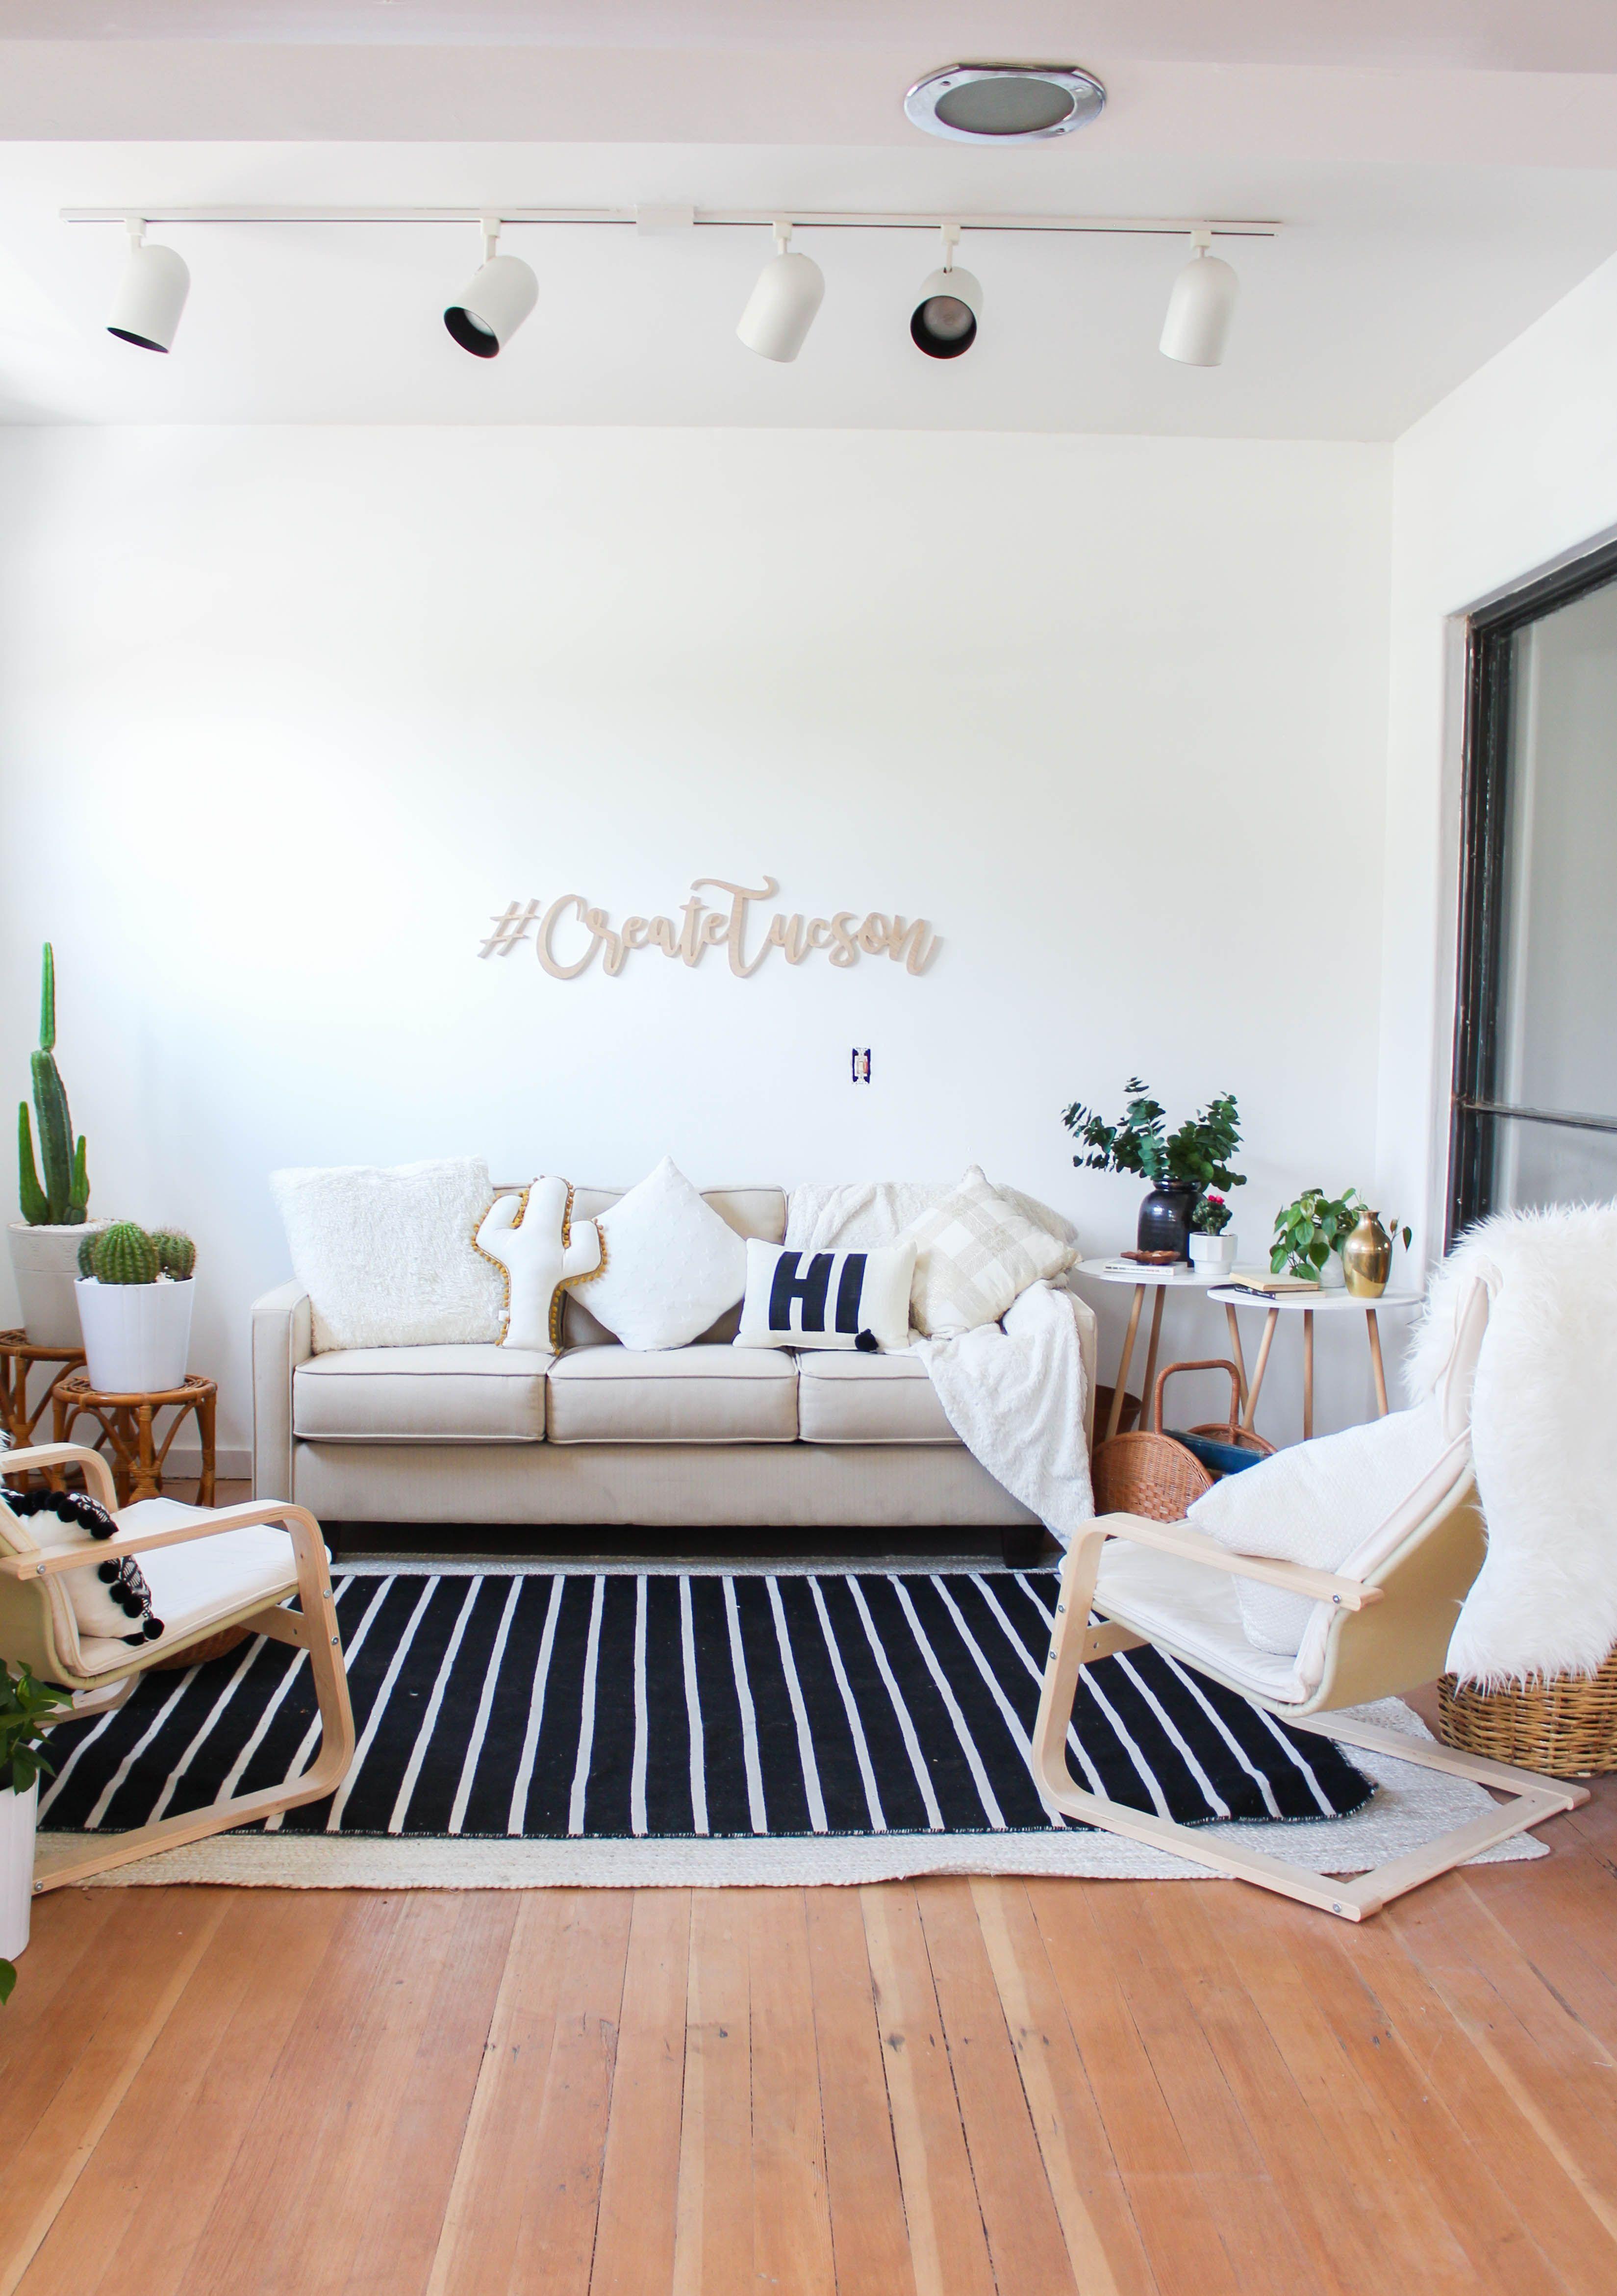 Creative Tribe Studio In Tucson Arizona With Southwest And Modern Decor Home Decor Decor Home Decor Decals